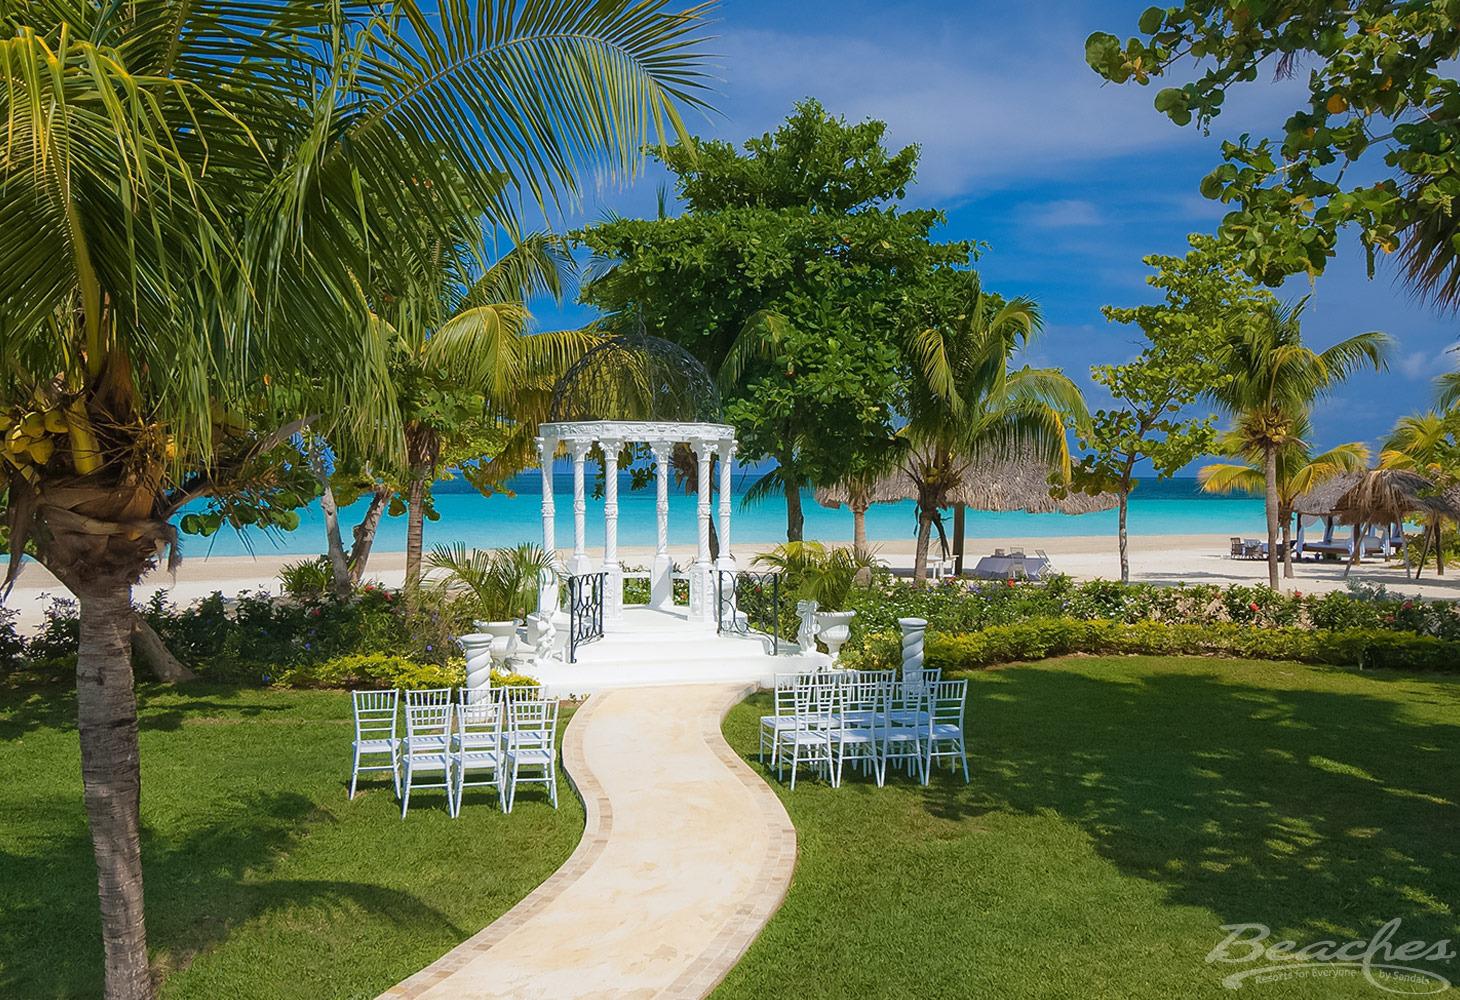 Beaches Negril Weddings